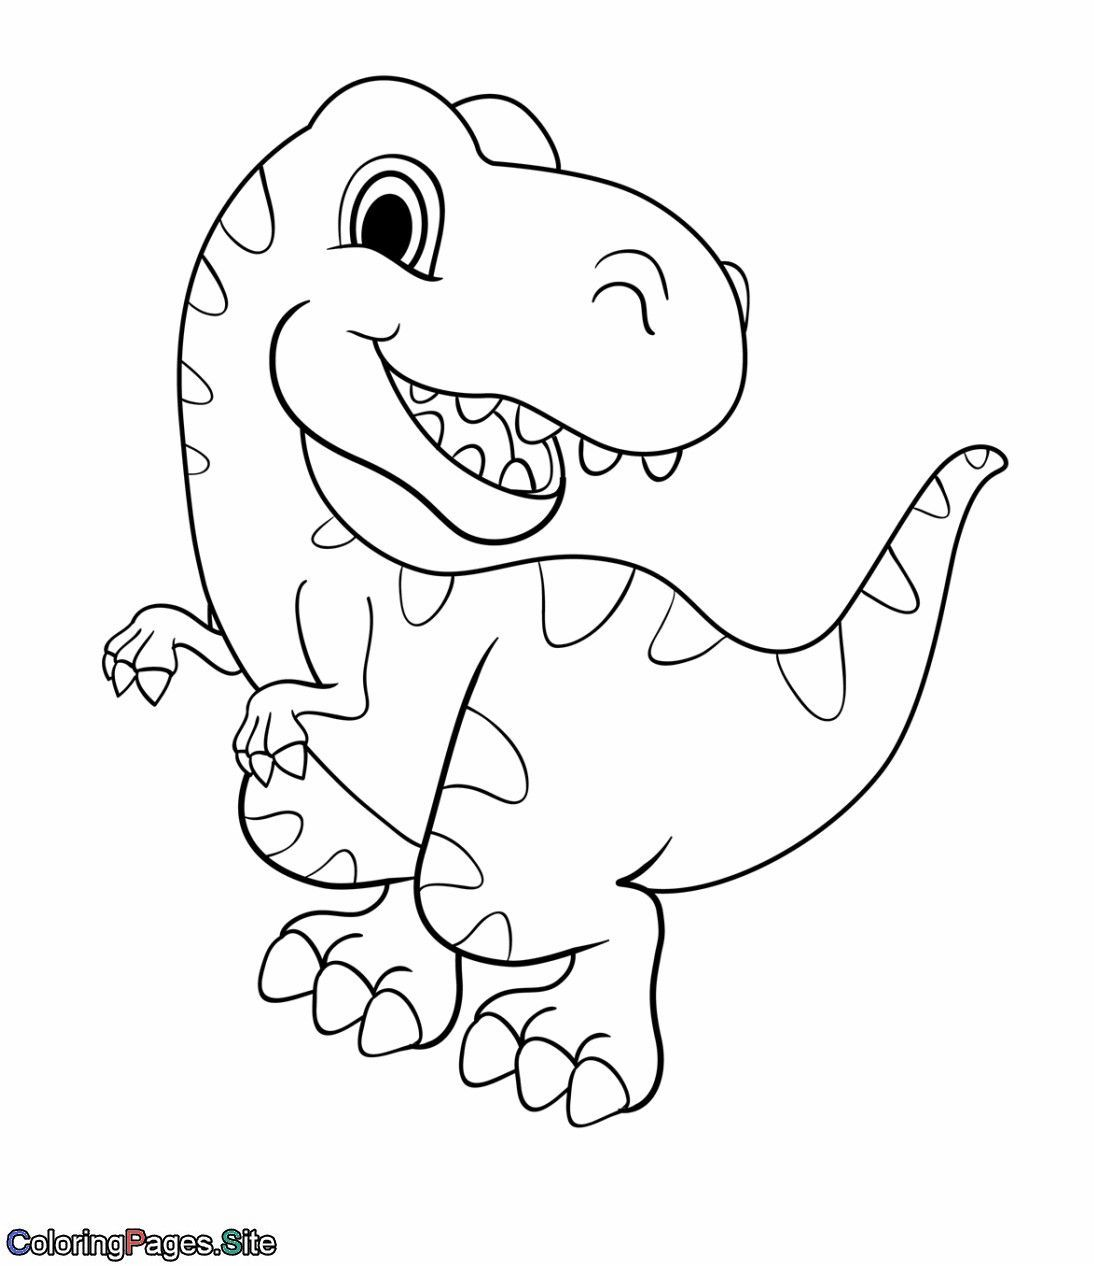 Dinosaur Coloring Pages Cute Cartoon Dinosaur Coloring Page Free Printable Coloring Pages Entitlementtrap Com Dinosaur Coloring Sheets Dinosaur Coloring Pages Dinosaur Coloring